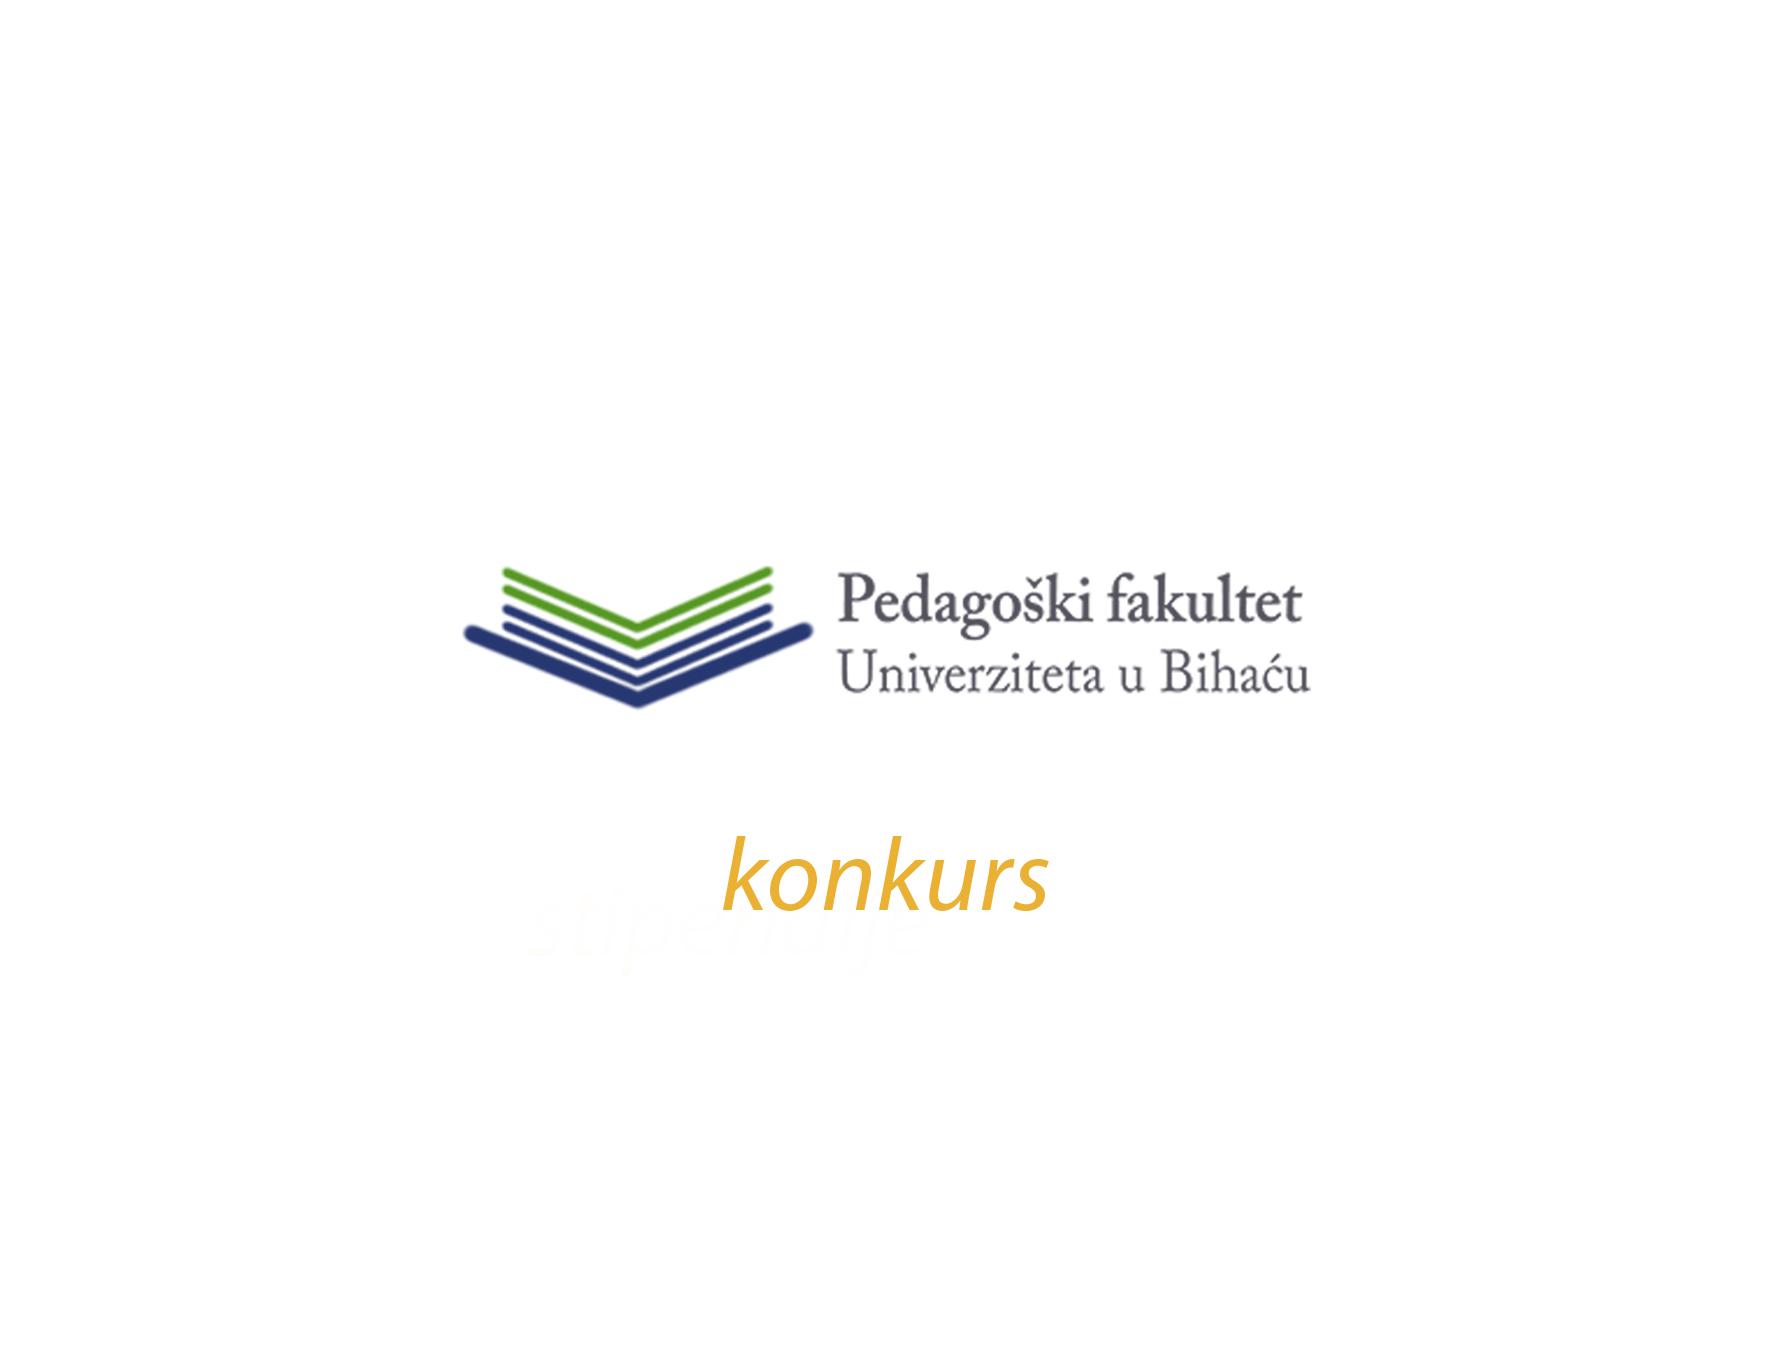 Konkurs Pedagoškog fakulteta Univerziteta u Bihaću